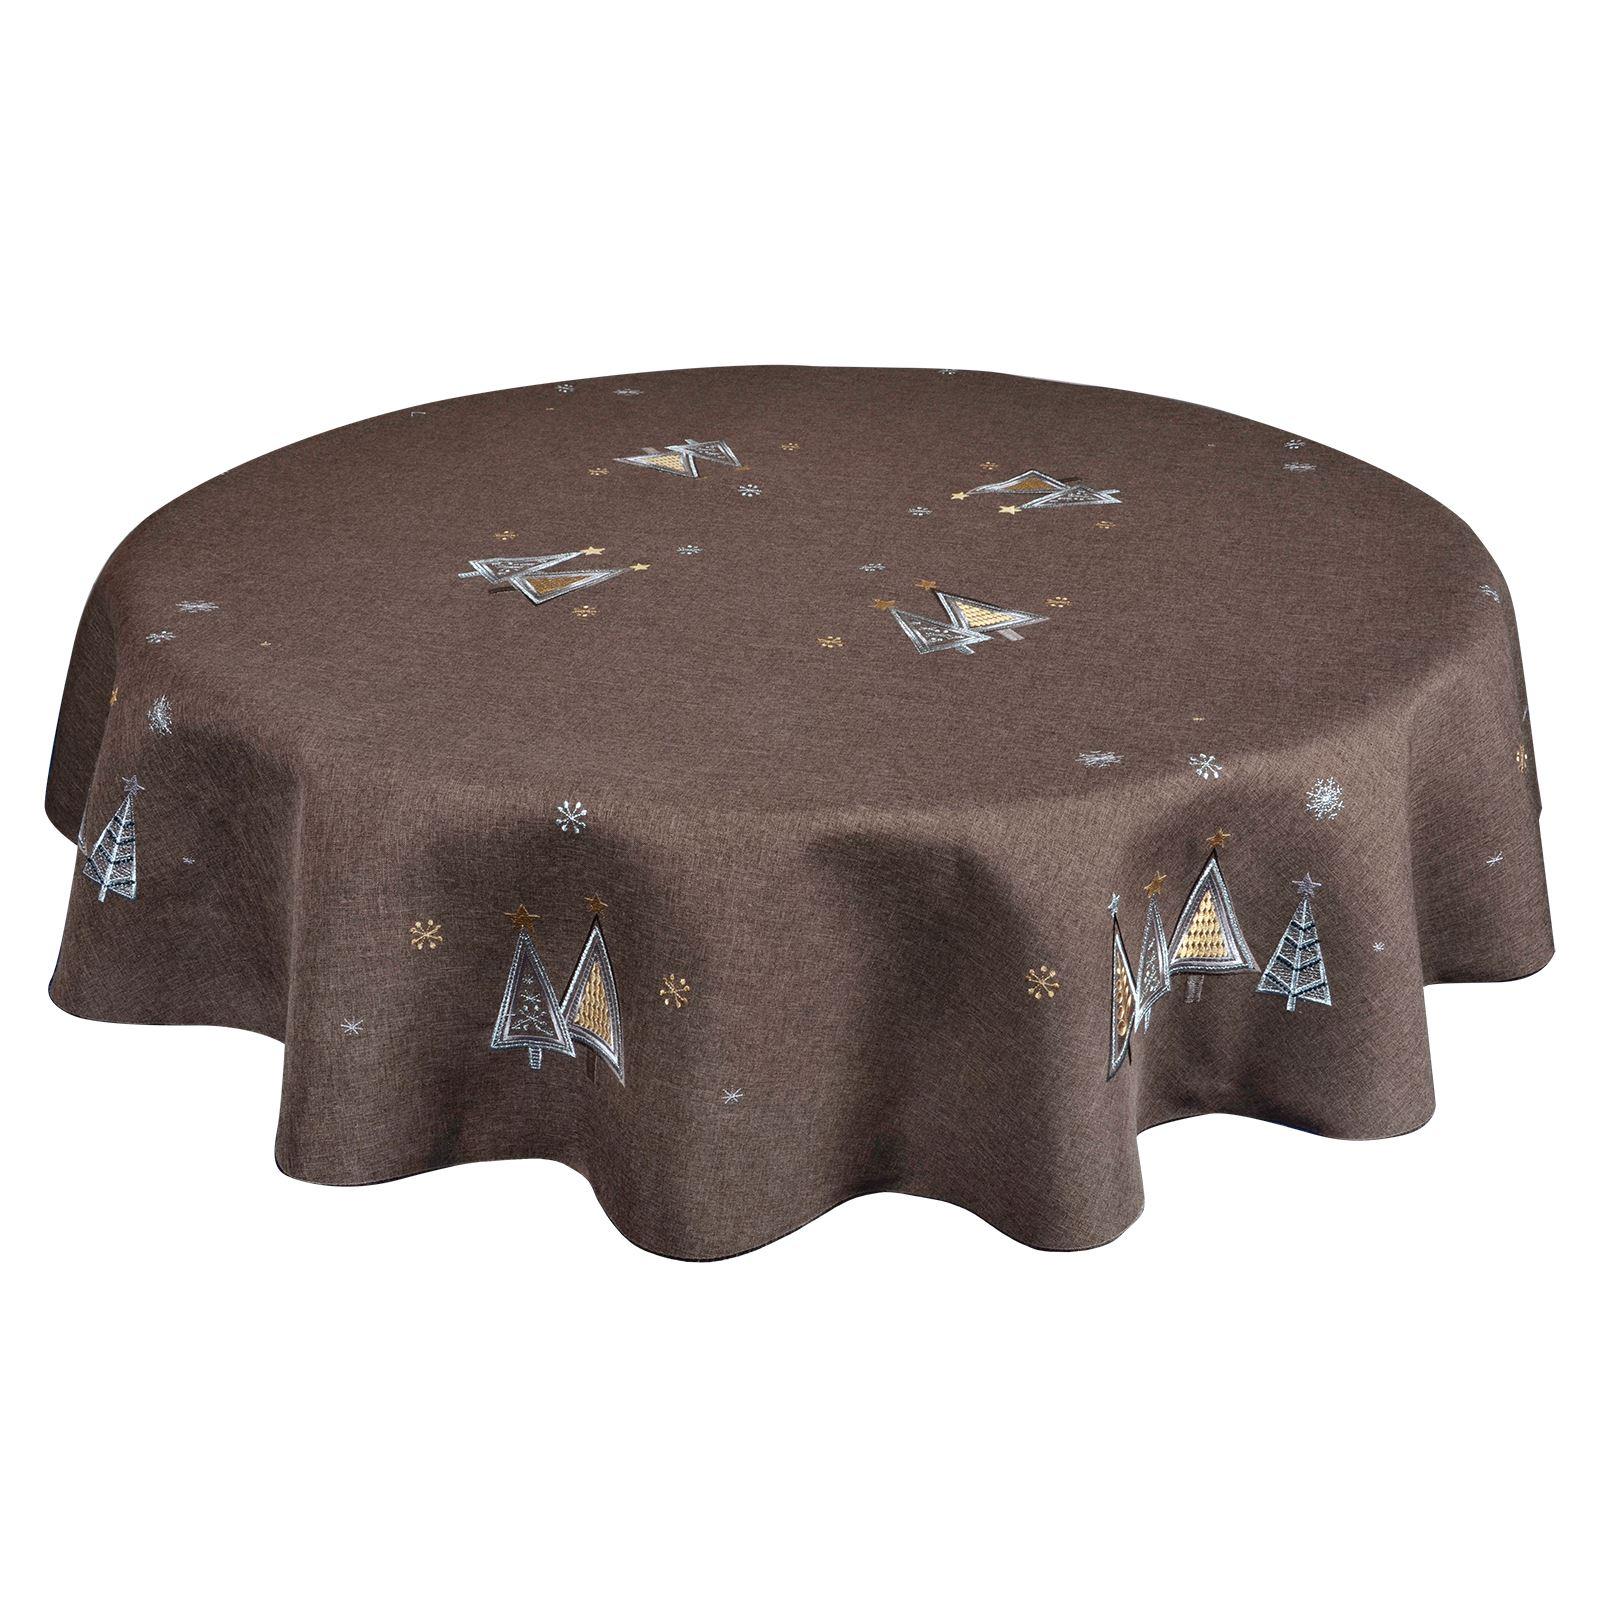 Christmas-Tablecloth-Festive-Pattern-Rectangle-Round-Fabric-Xmas-Room-Decoration Indexbild 26